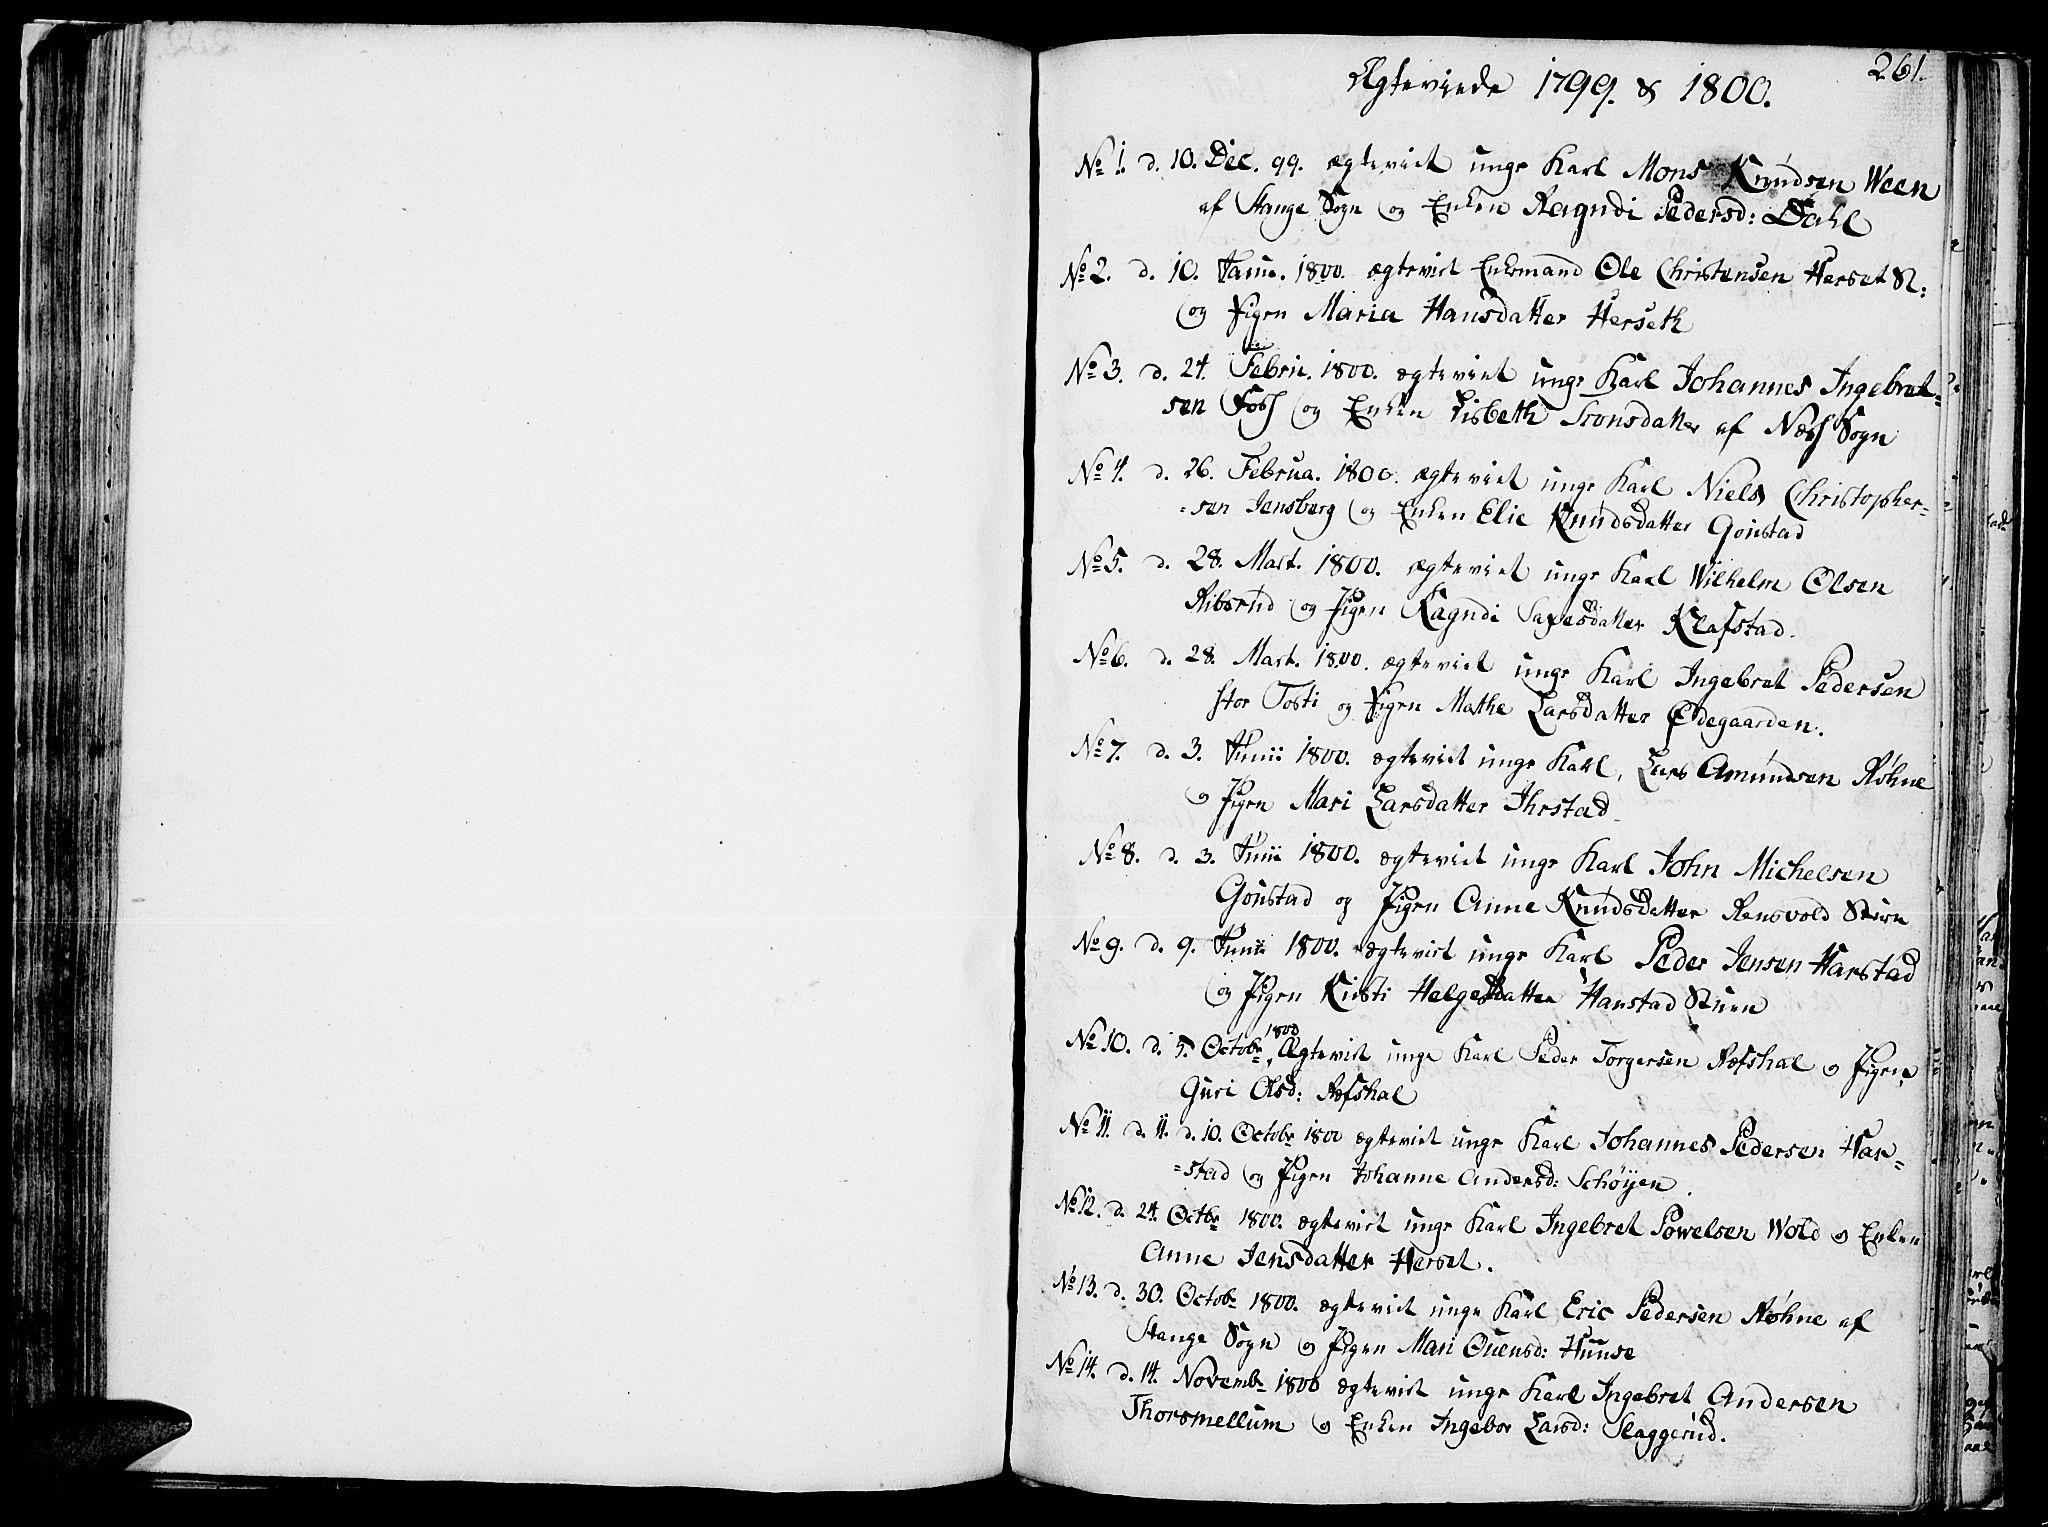 SAH, Romedal prestekontor, K/L0001: Ministerialbok nr. 1, 1799-1814, s. 261